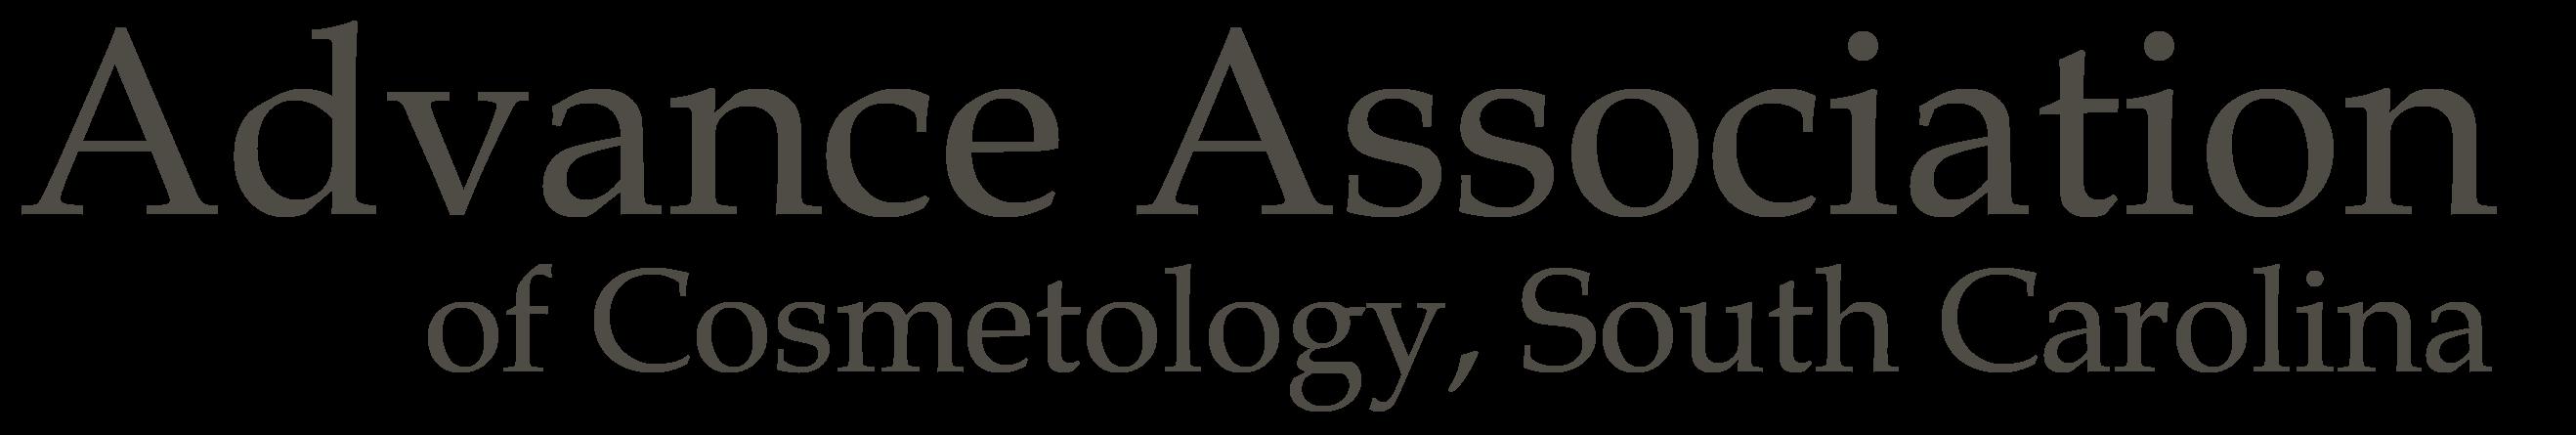 Advance Association of Cosmetology | South Carolina